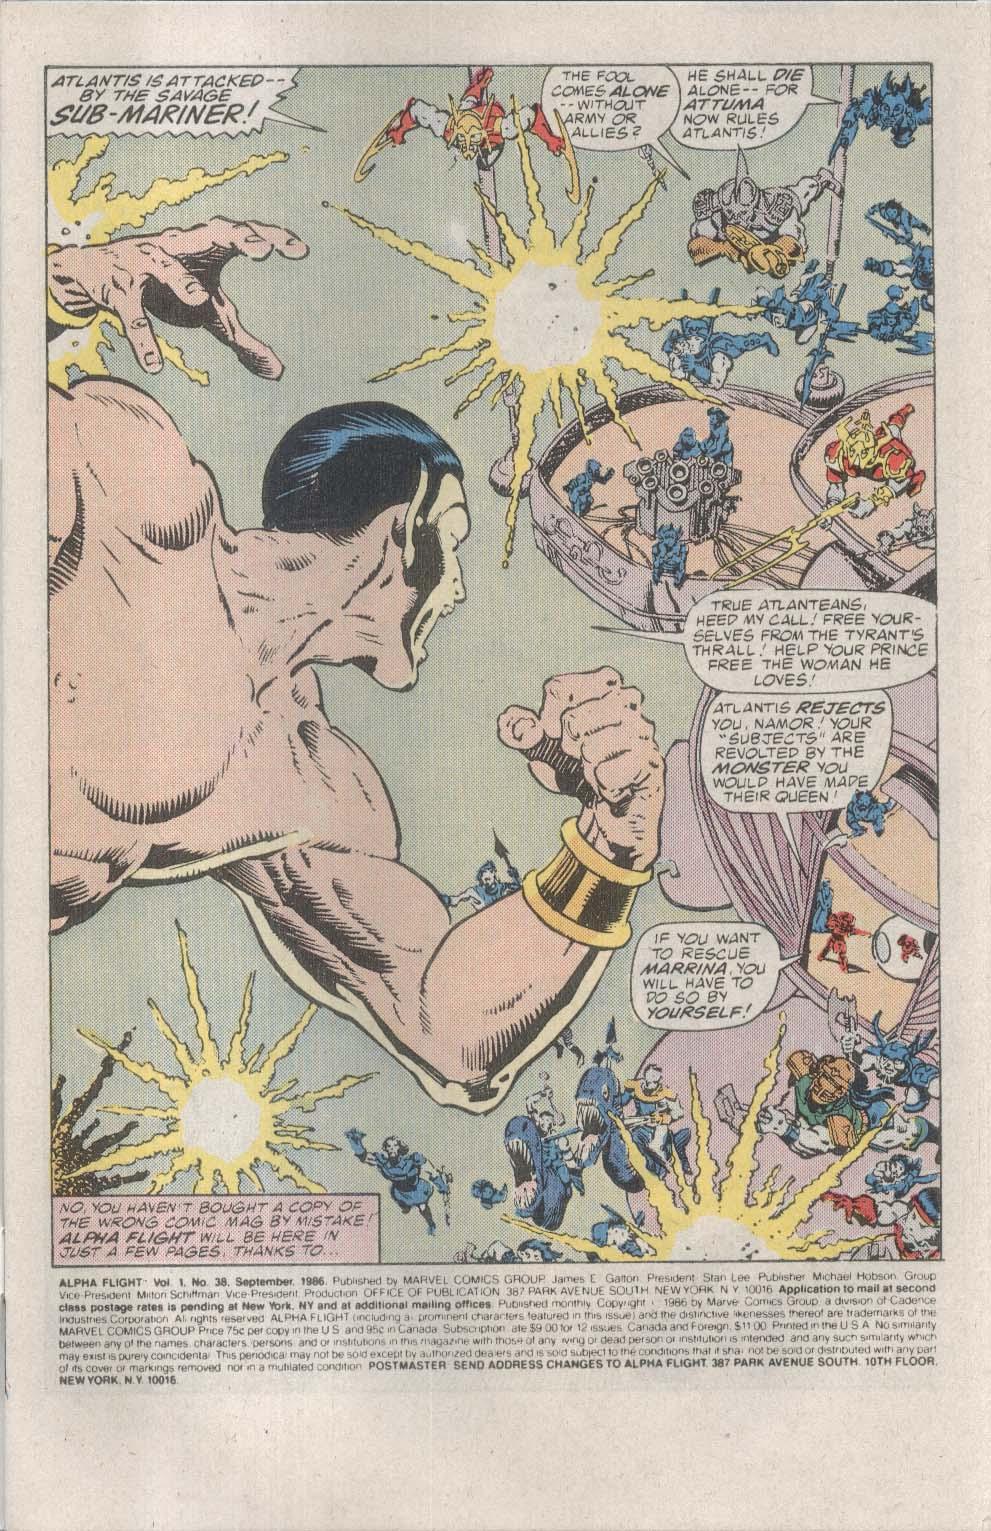 ALPHA FLIGHT #38 Marvel comic book 9 1986